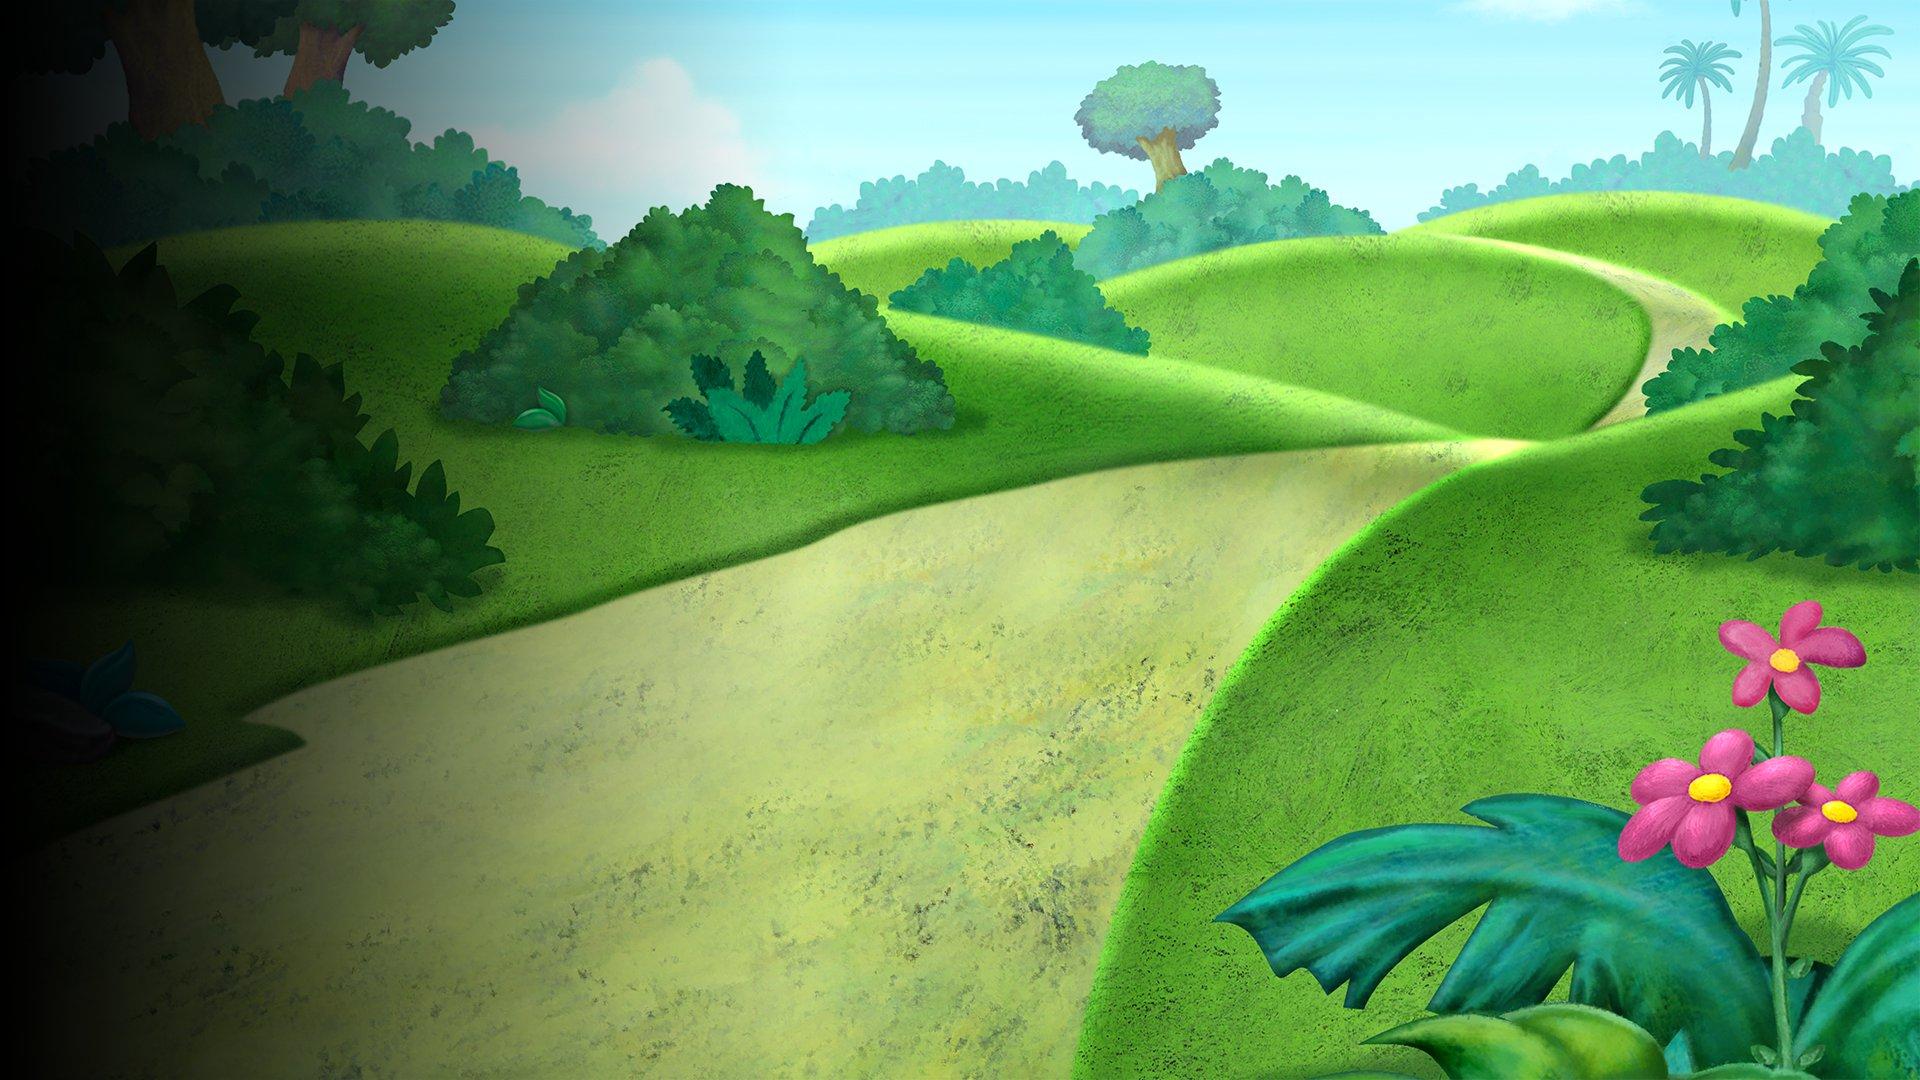 fond Dora l'exploratrice - Danse, Dora, danse  ! - Extrait